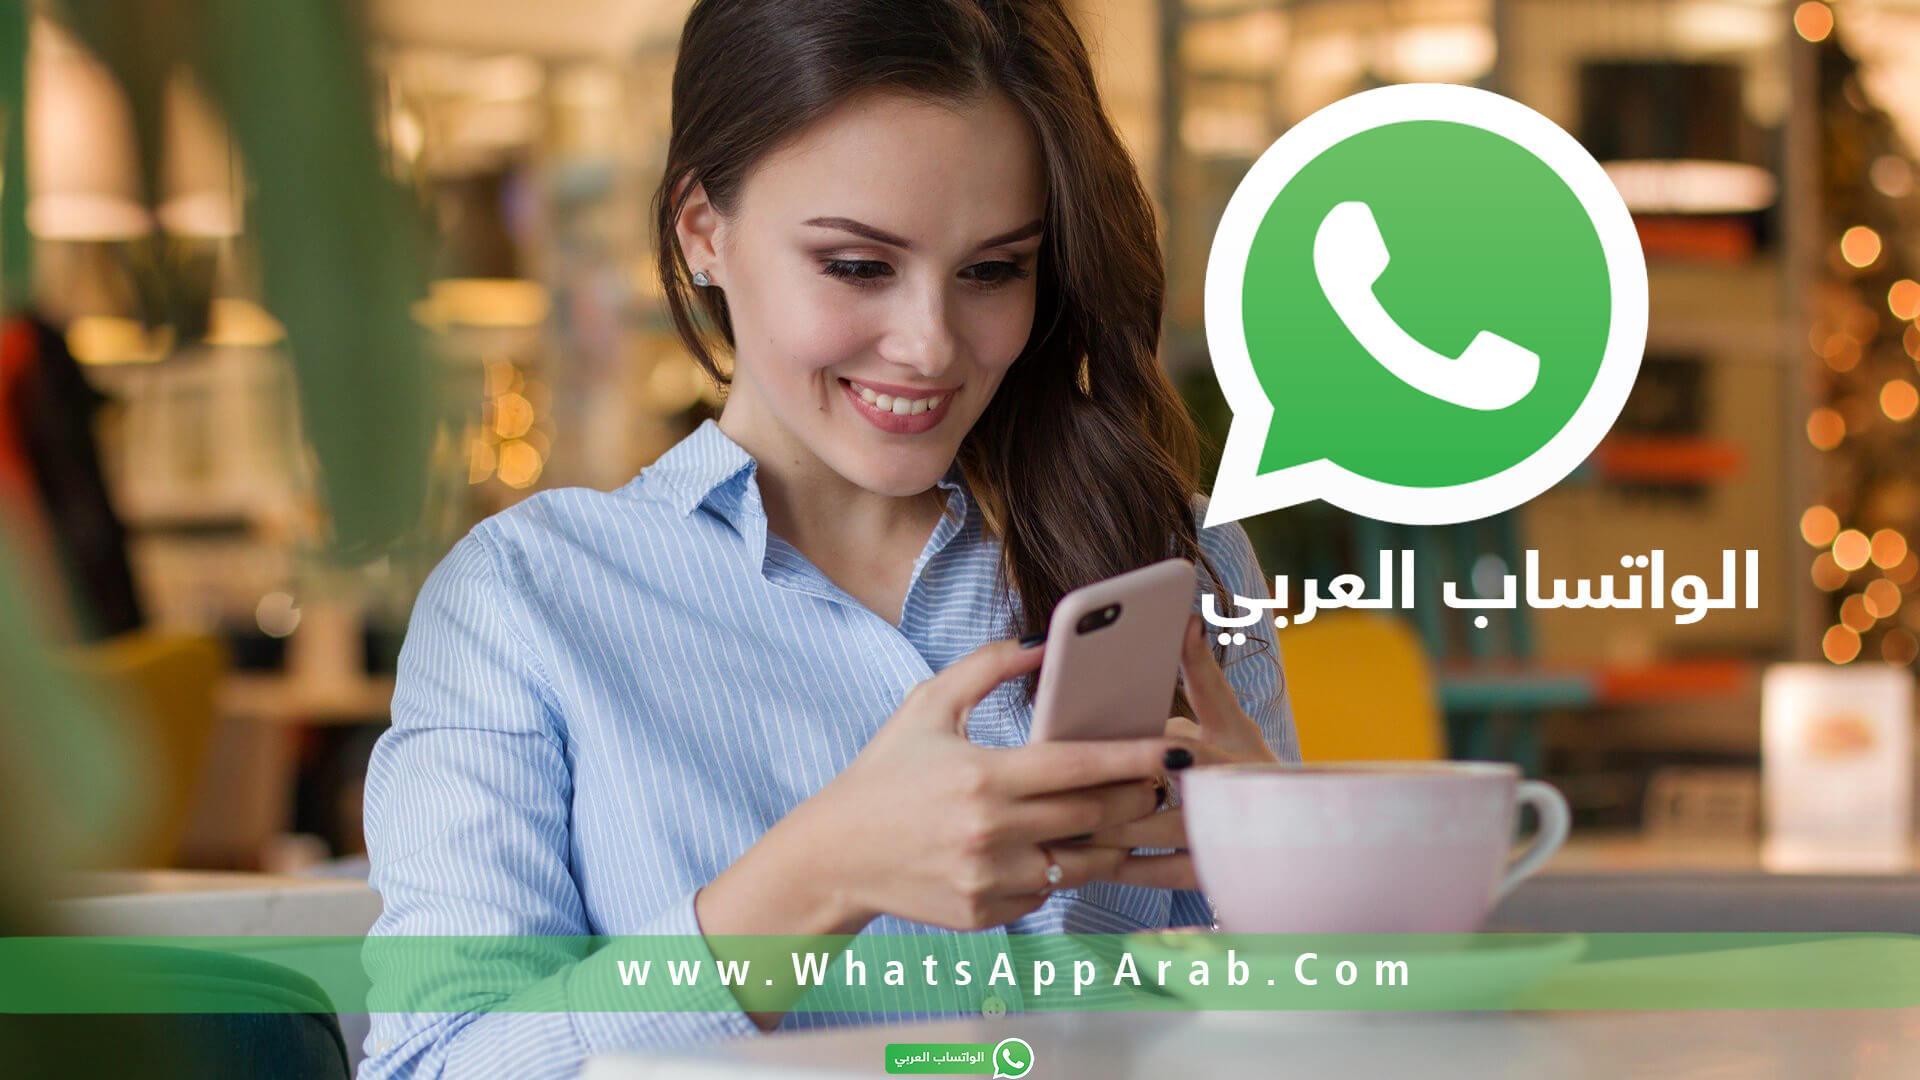 whatsapp arab web - الواتساب العربي